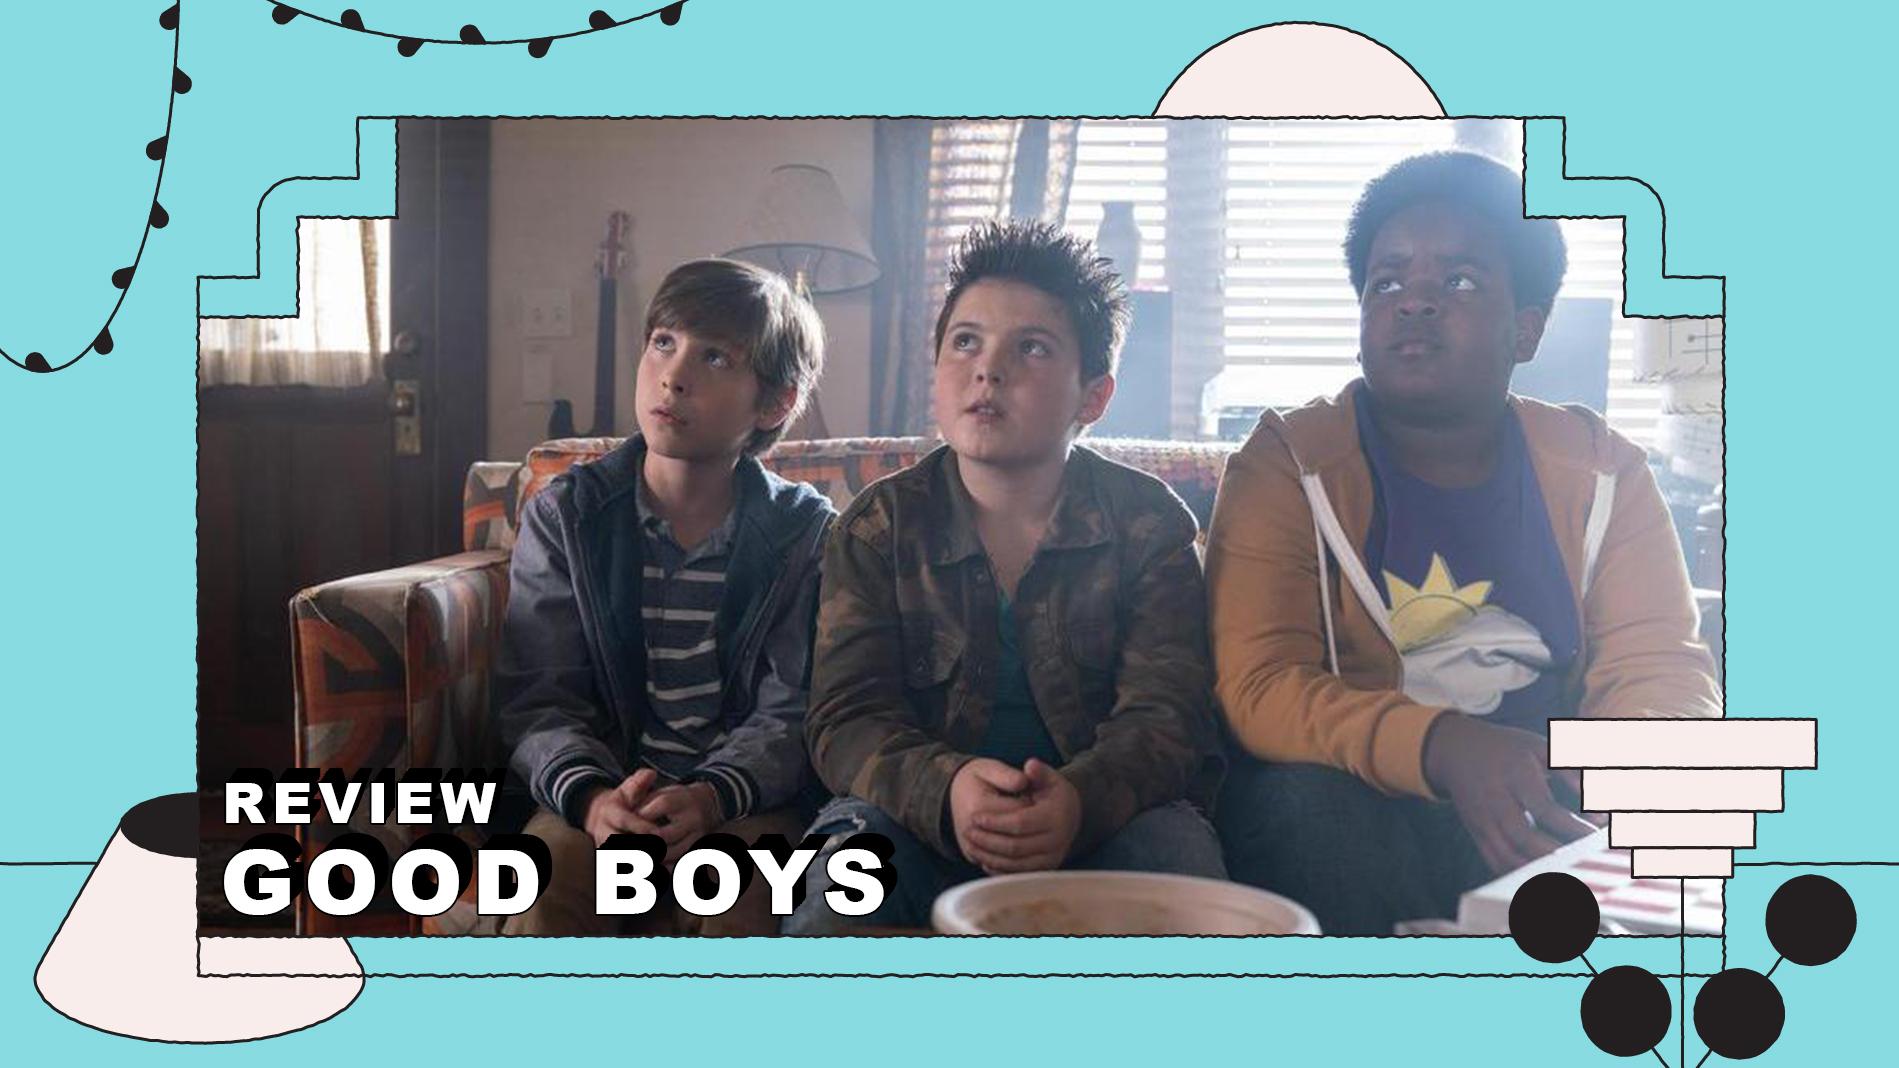 Good Boys Cover Image.jpg